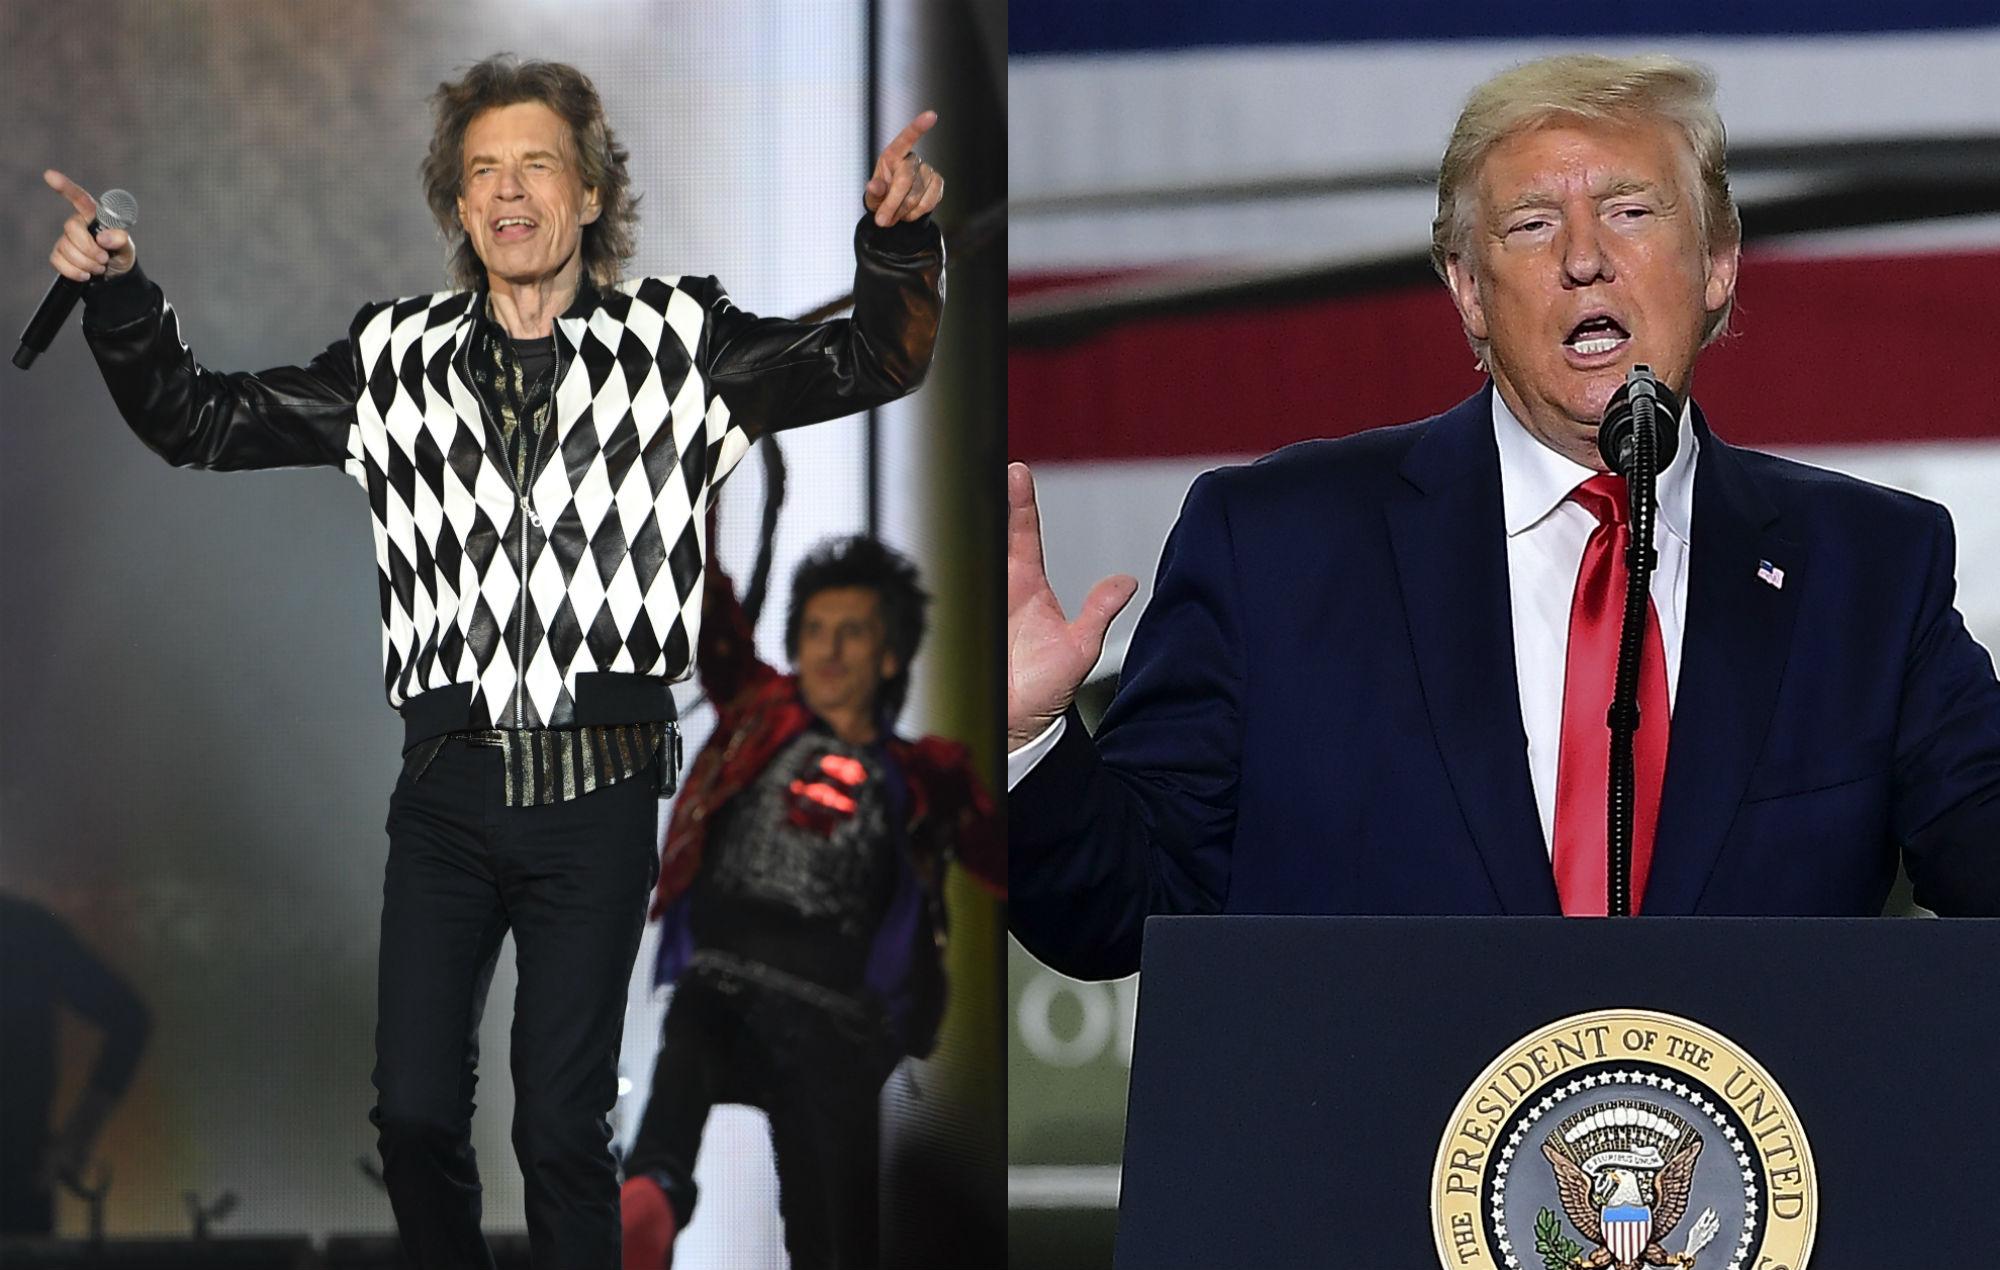 Mick Jagger / Donald Trump. Credit: Getty